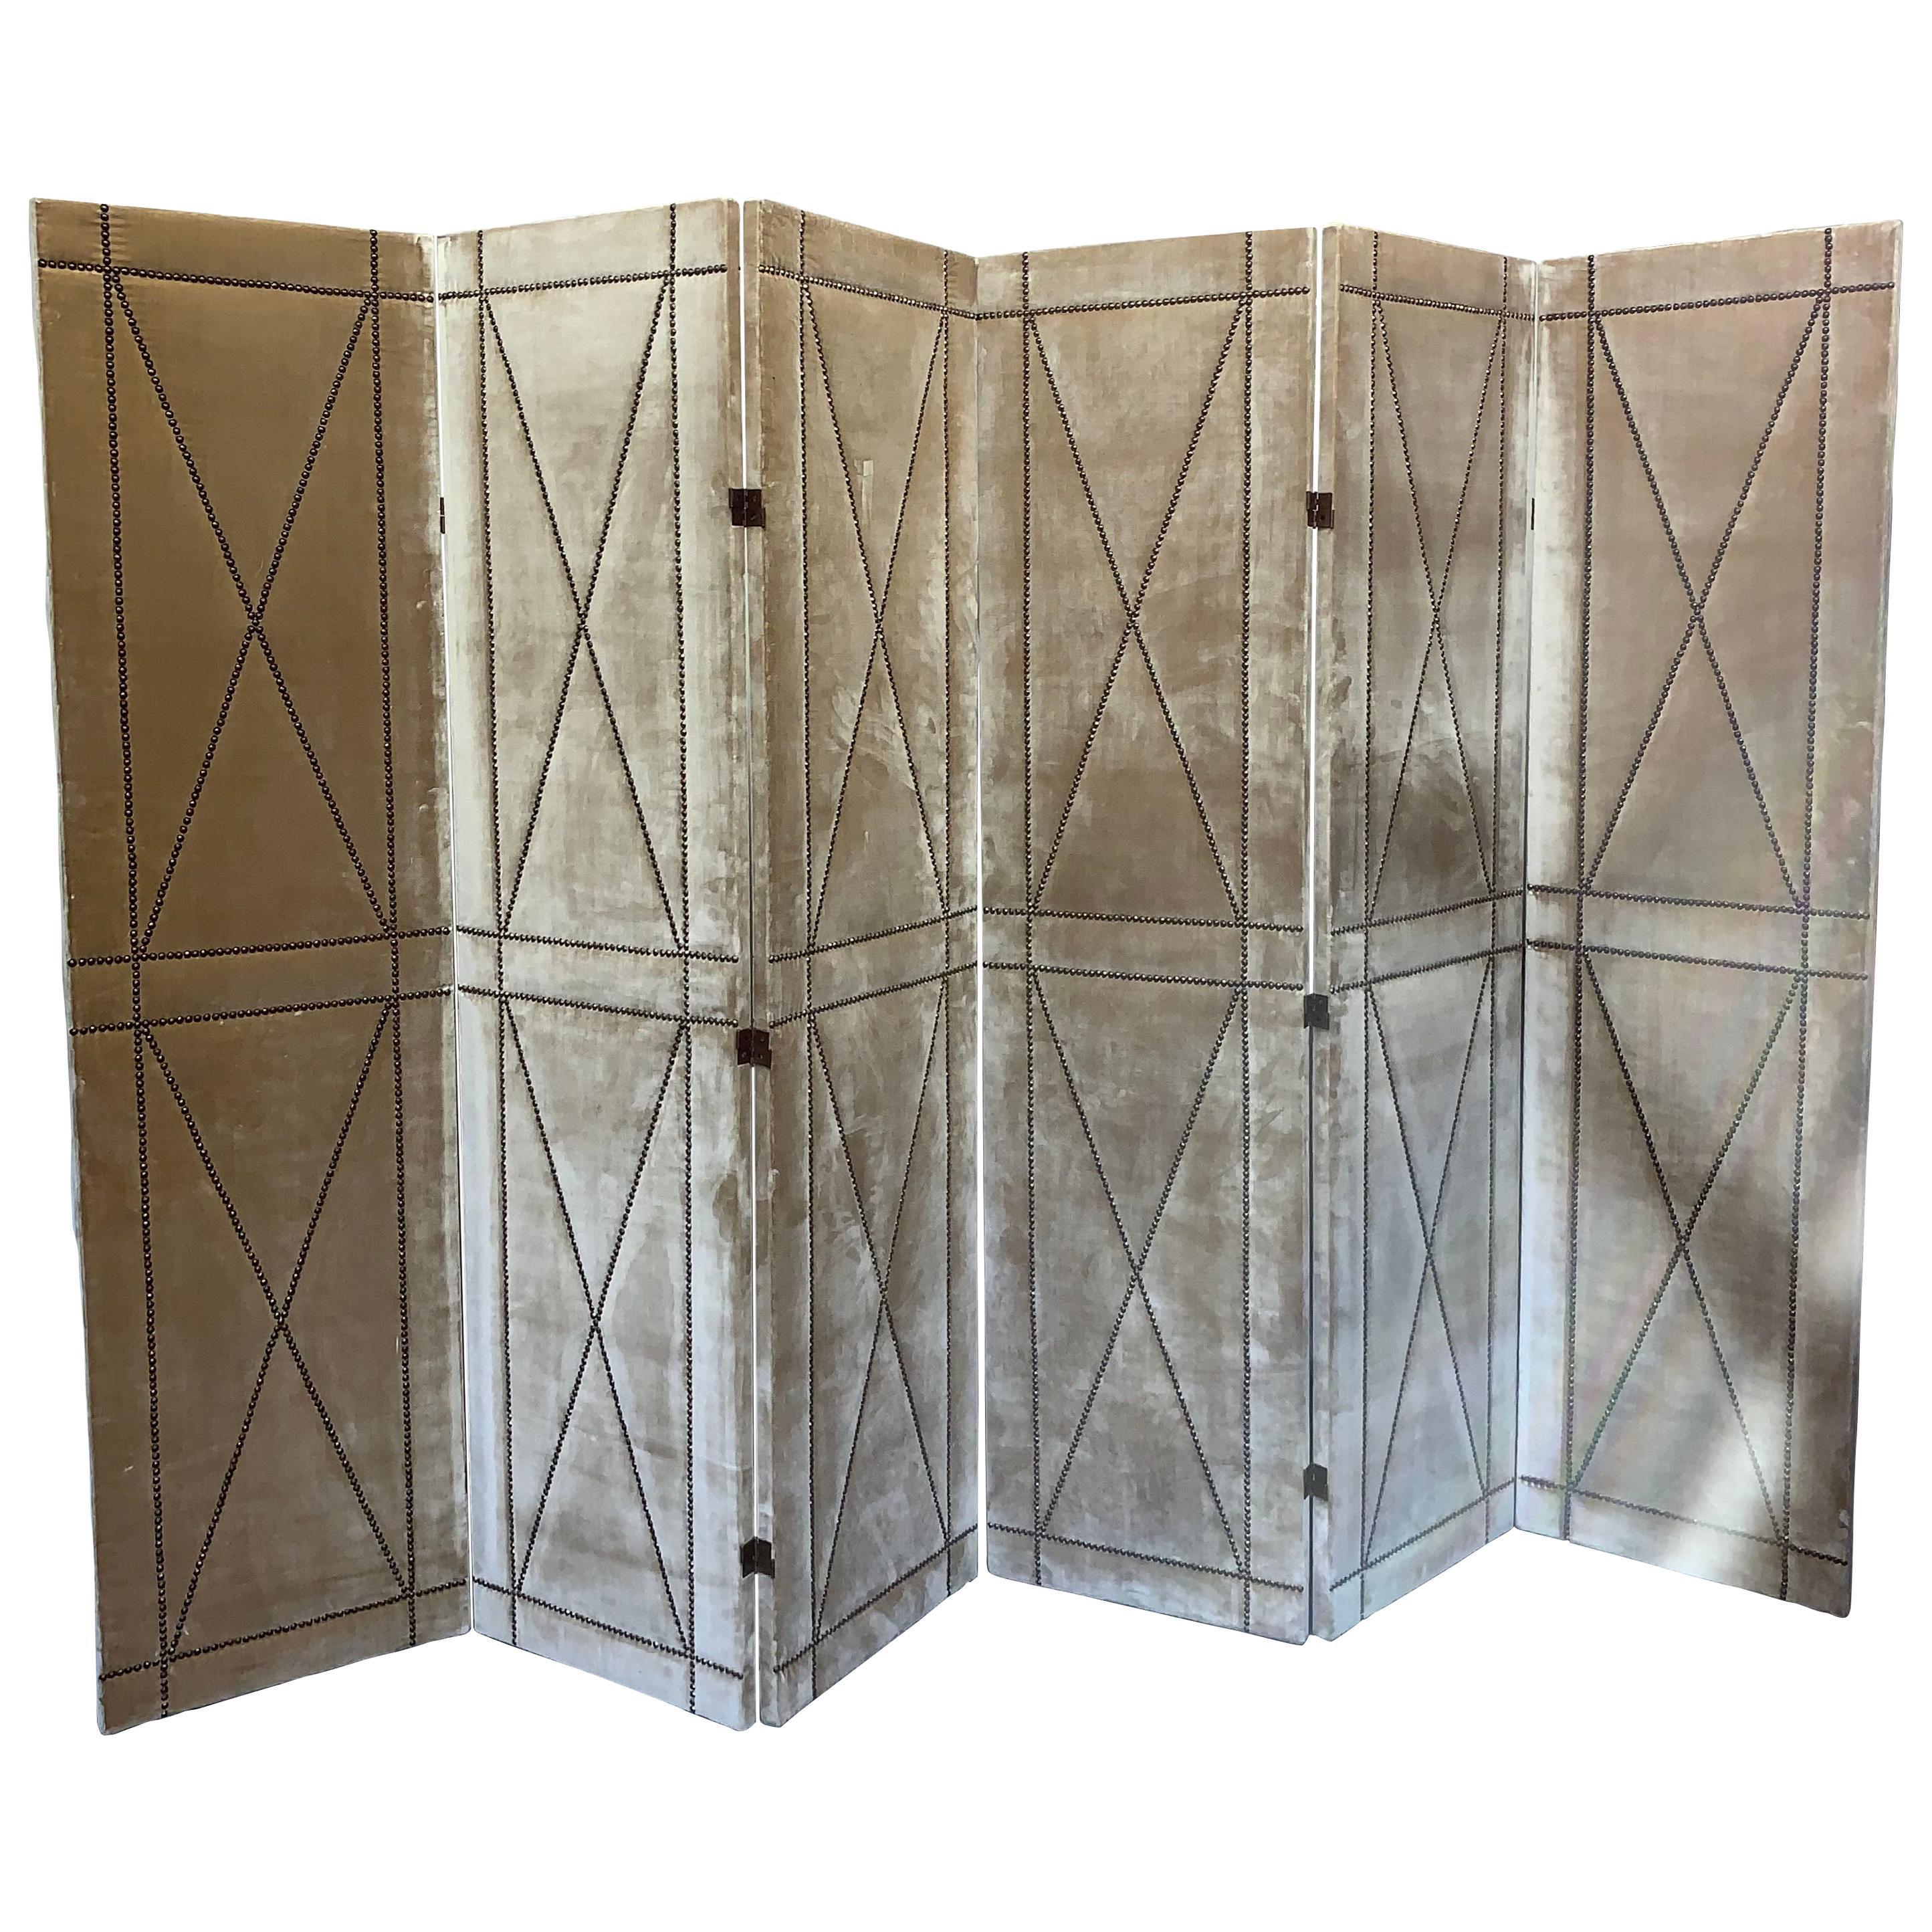 Pair of Velvet Screens with Nailhead Detail Designed by Juan Montoya